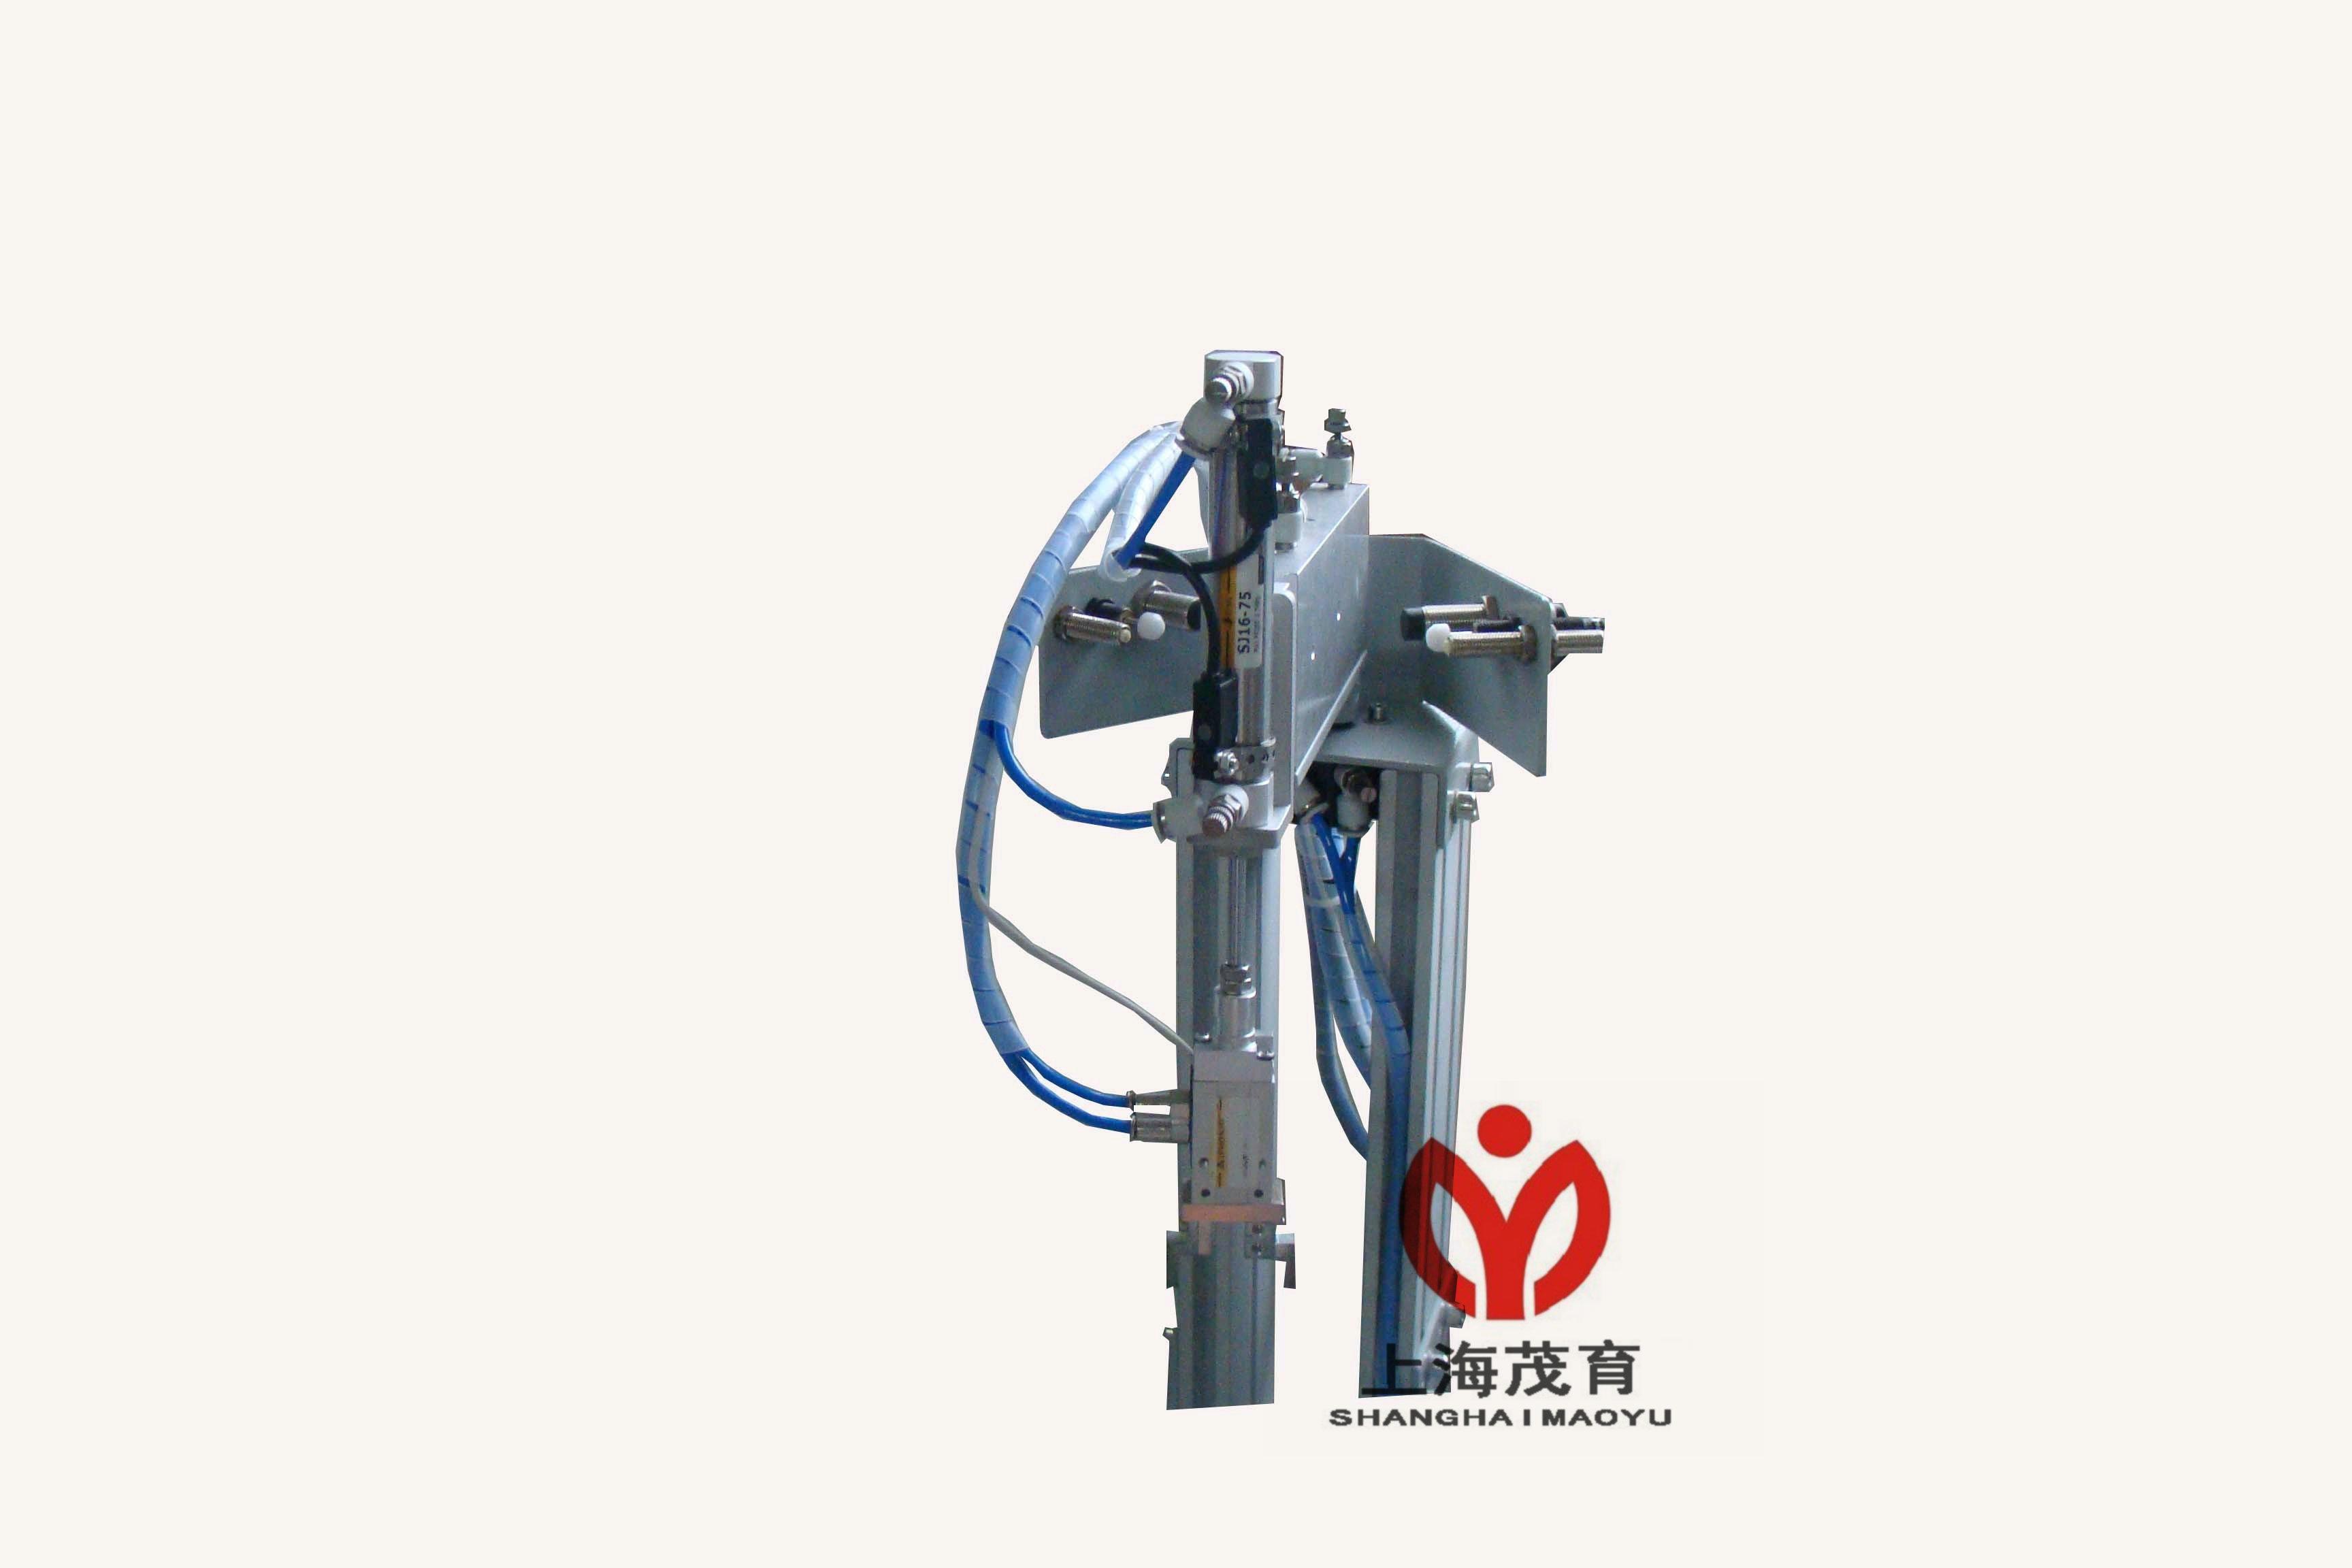 MYN-236A型光机电一体化控制实训装置在铝合金导轨式实训台上安装送料、输送、分拣等工作单元,构成一个典型的自动生产线的机械平台,系统各机构的采用了气动驱动、普通电机和变频器驱动控制以及各种传感器应用等技术。系统的控制方式采用一台PLC承担其控制任务,在有限的资源下,如何合理的分配各个单元的I/O接口的非常重要的。因此,235综合应用了多种技术知识,如气动控制技术、机械技术(机械传动、机械连接等)、传感器应用技术、PLC控制、变频器技术触摸屏技术和合理分配PLC(I/O点)等。利用235可以模拟一个与实